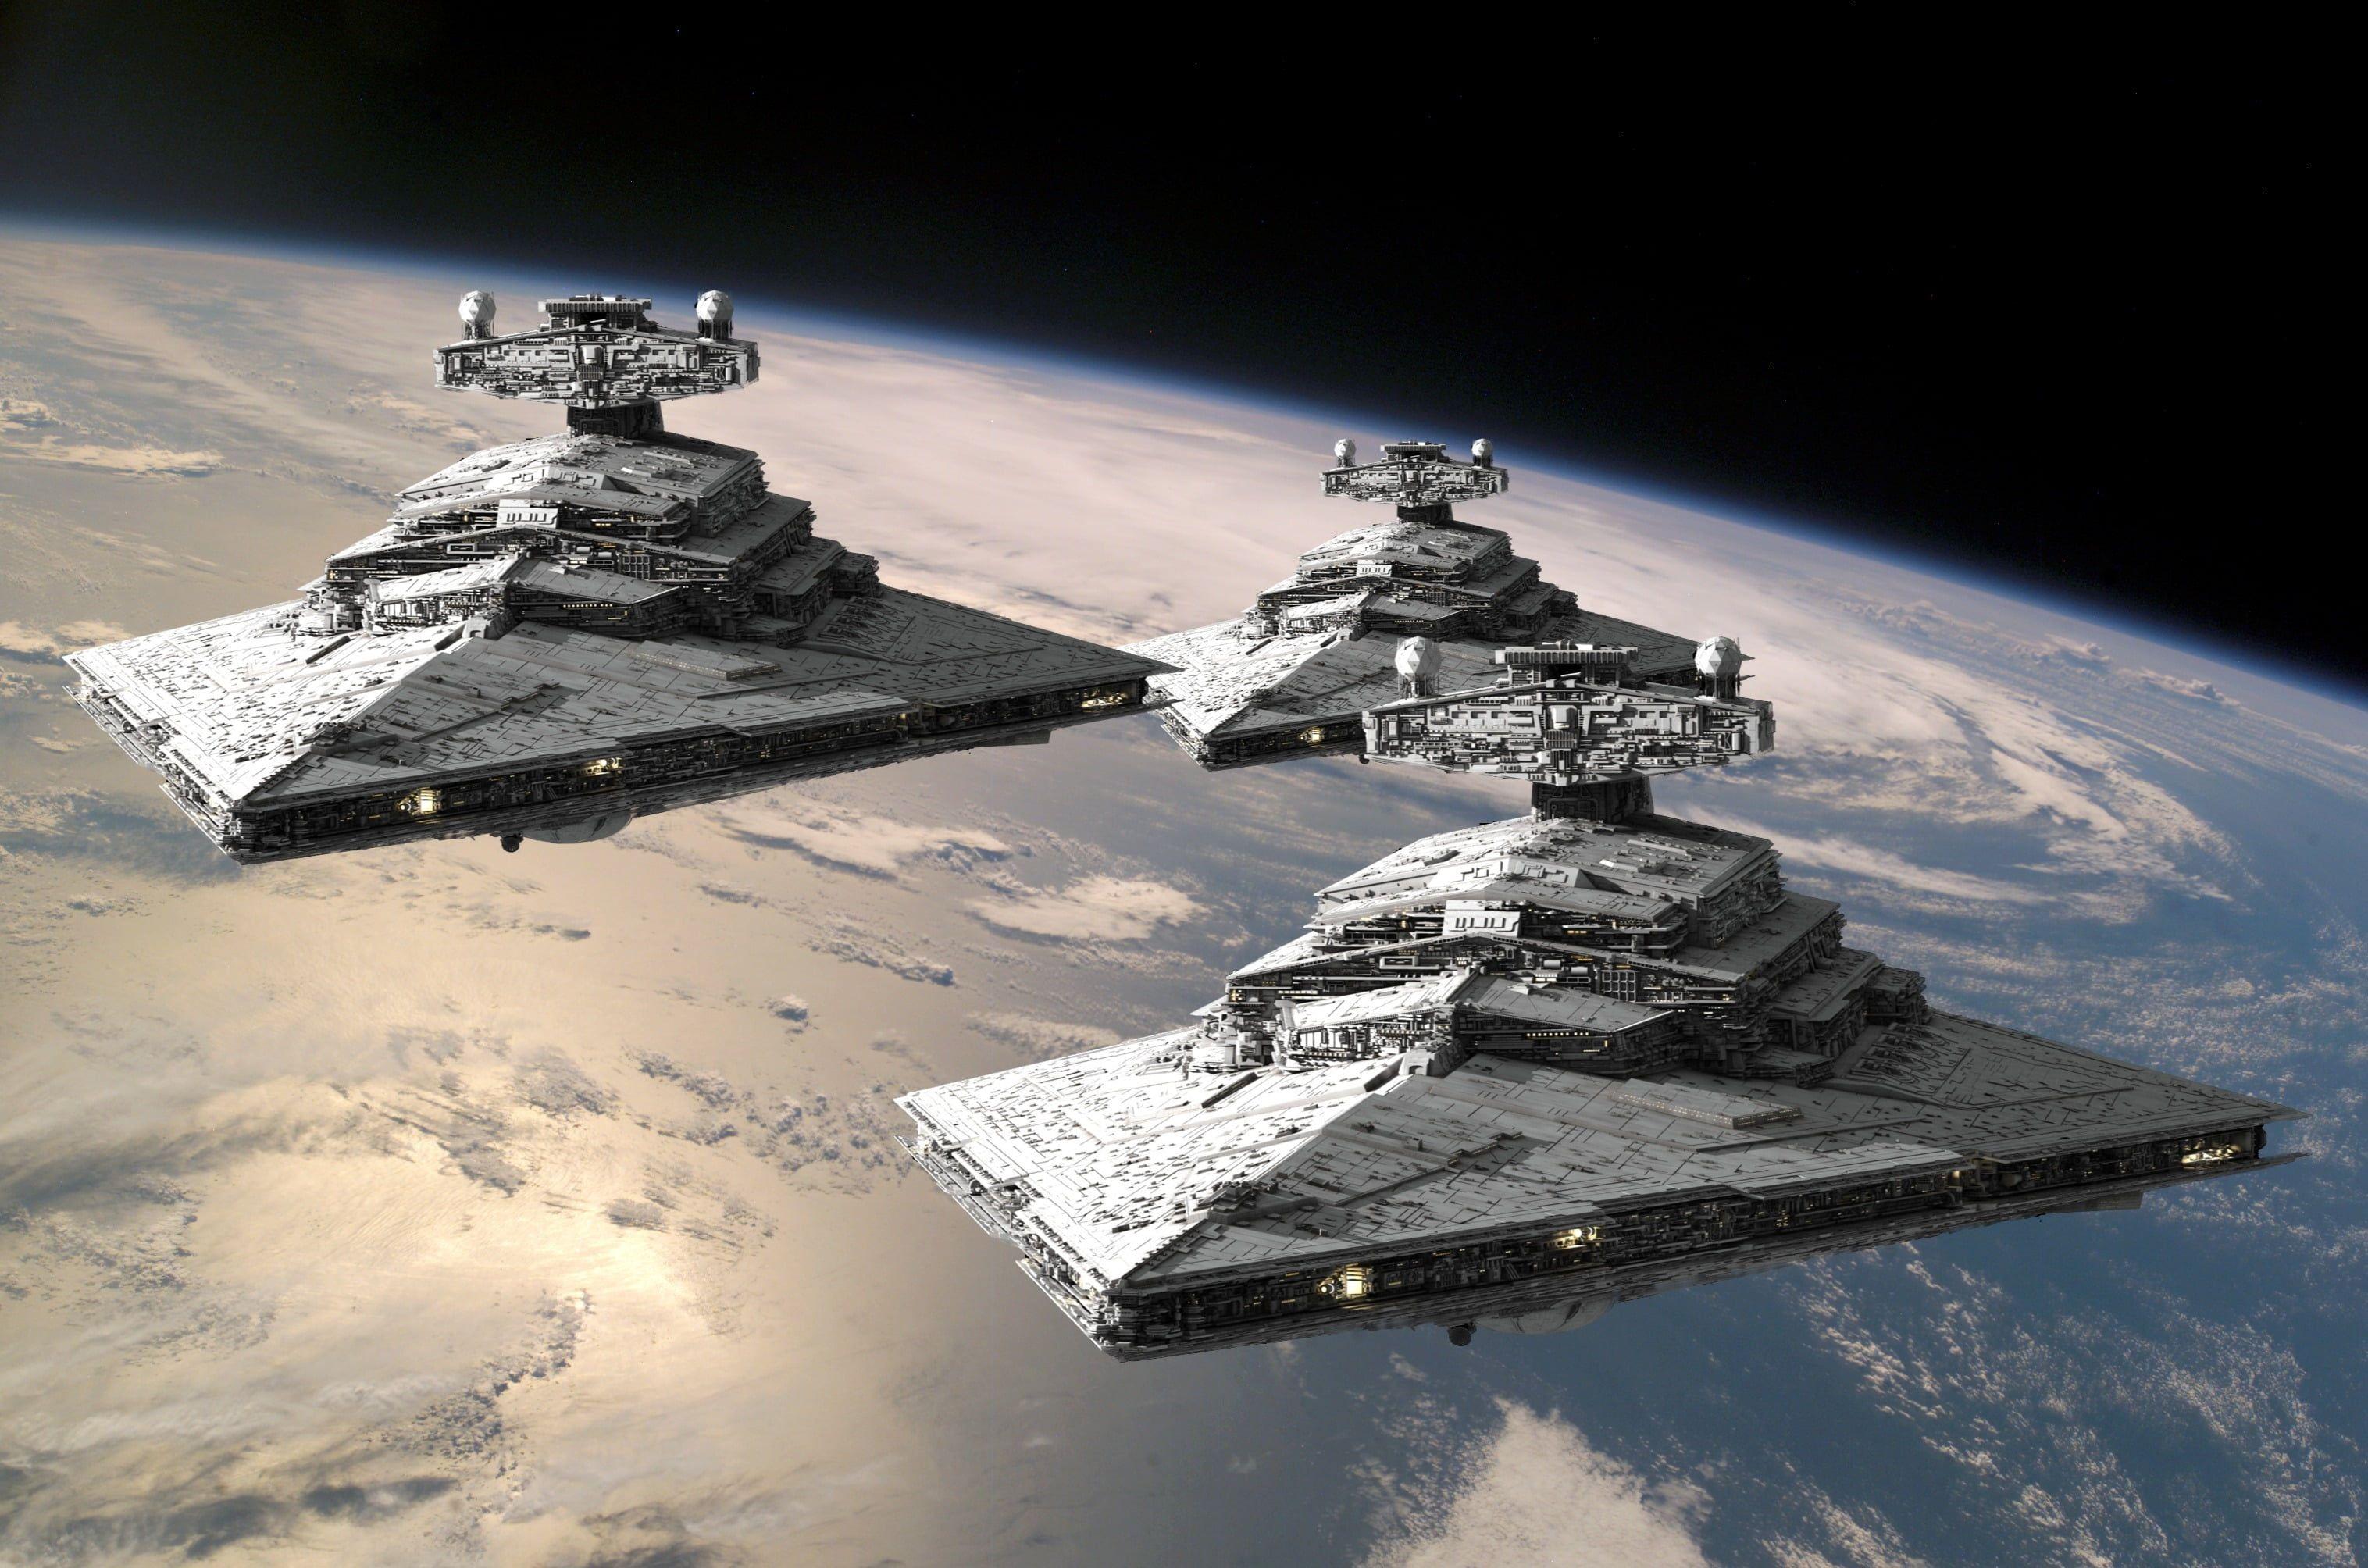 Three Gray Space Aircrafts Star Wars Star Destroyer 2k Wallpaper Hdwallpaper Desktop Star Wars Wallpaper Star Destroyer Wallpaper Star Destroyer